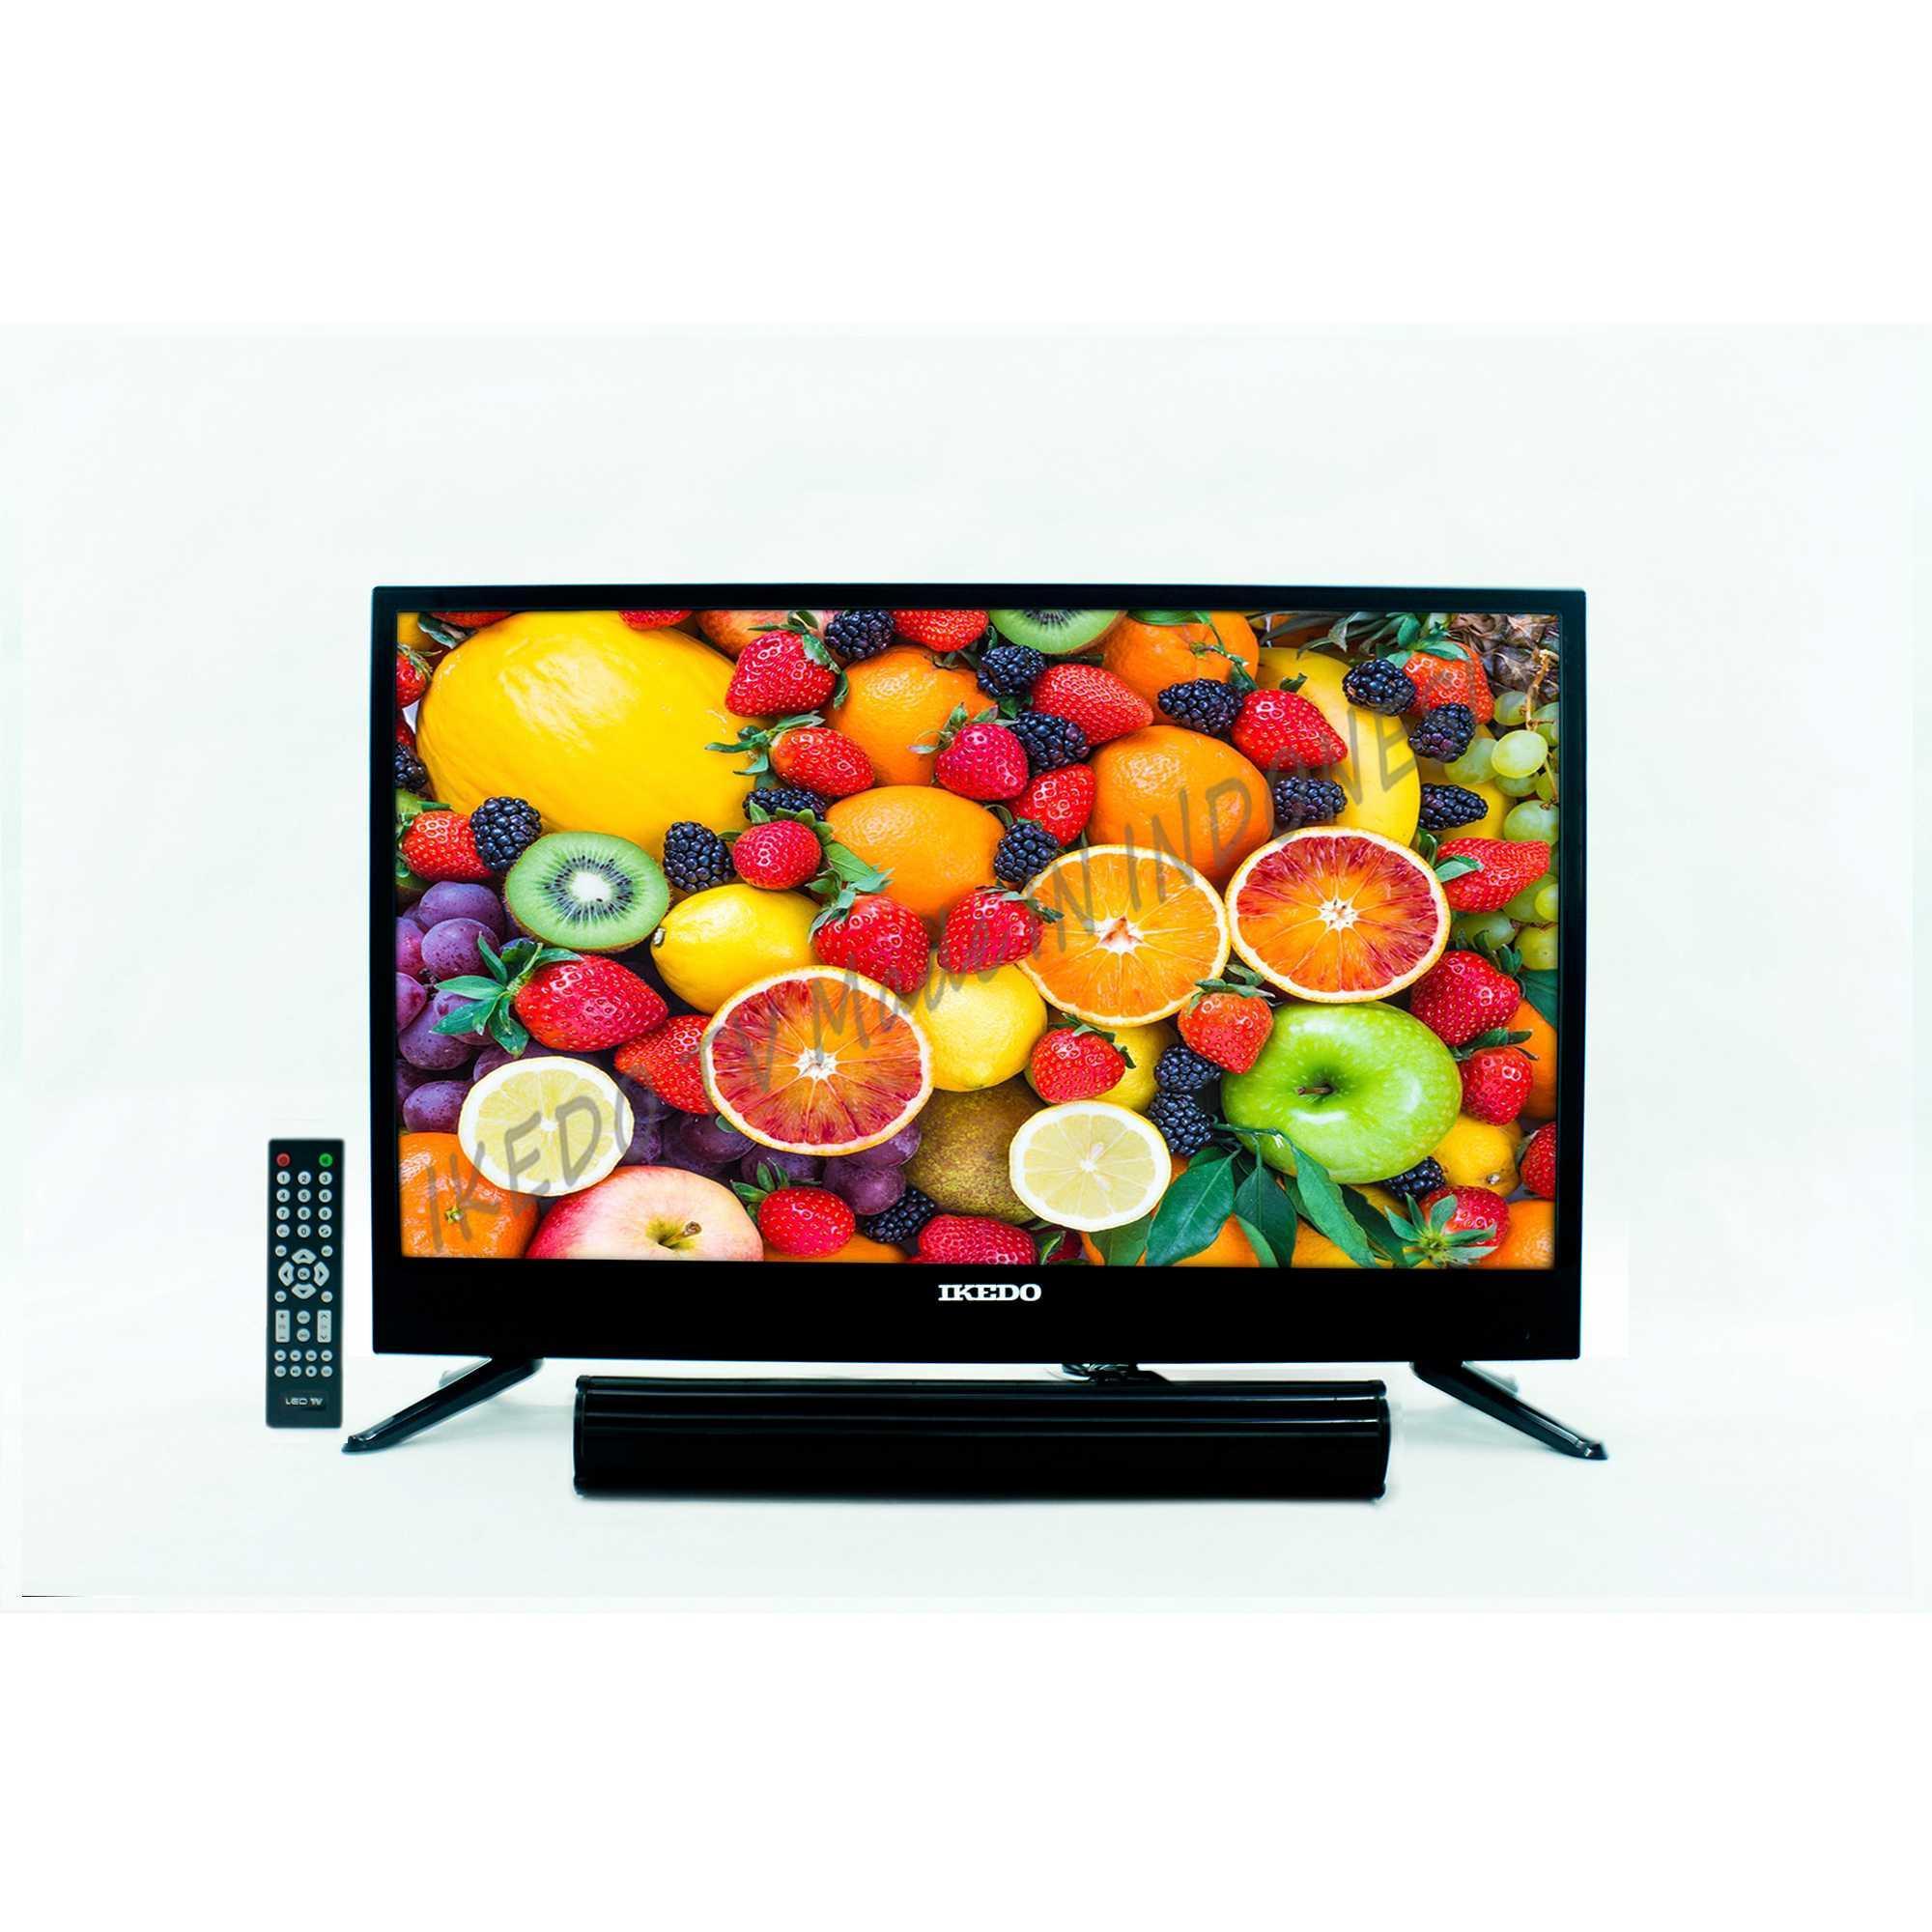 TV LED OLED DLED QLED IKEDO LT 32M1 FULL HD DISPLAY MURAH TERBARU